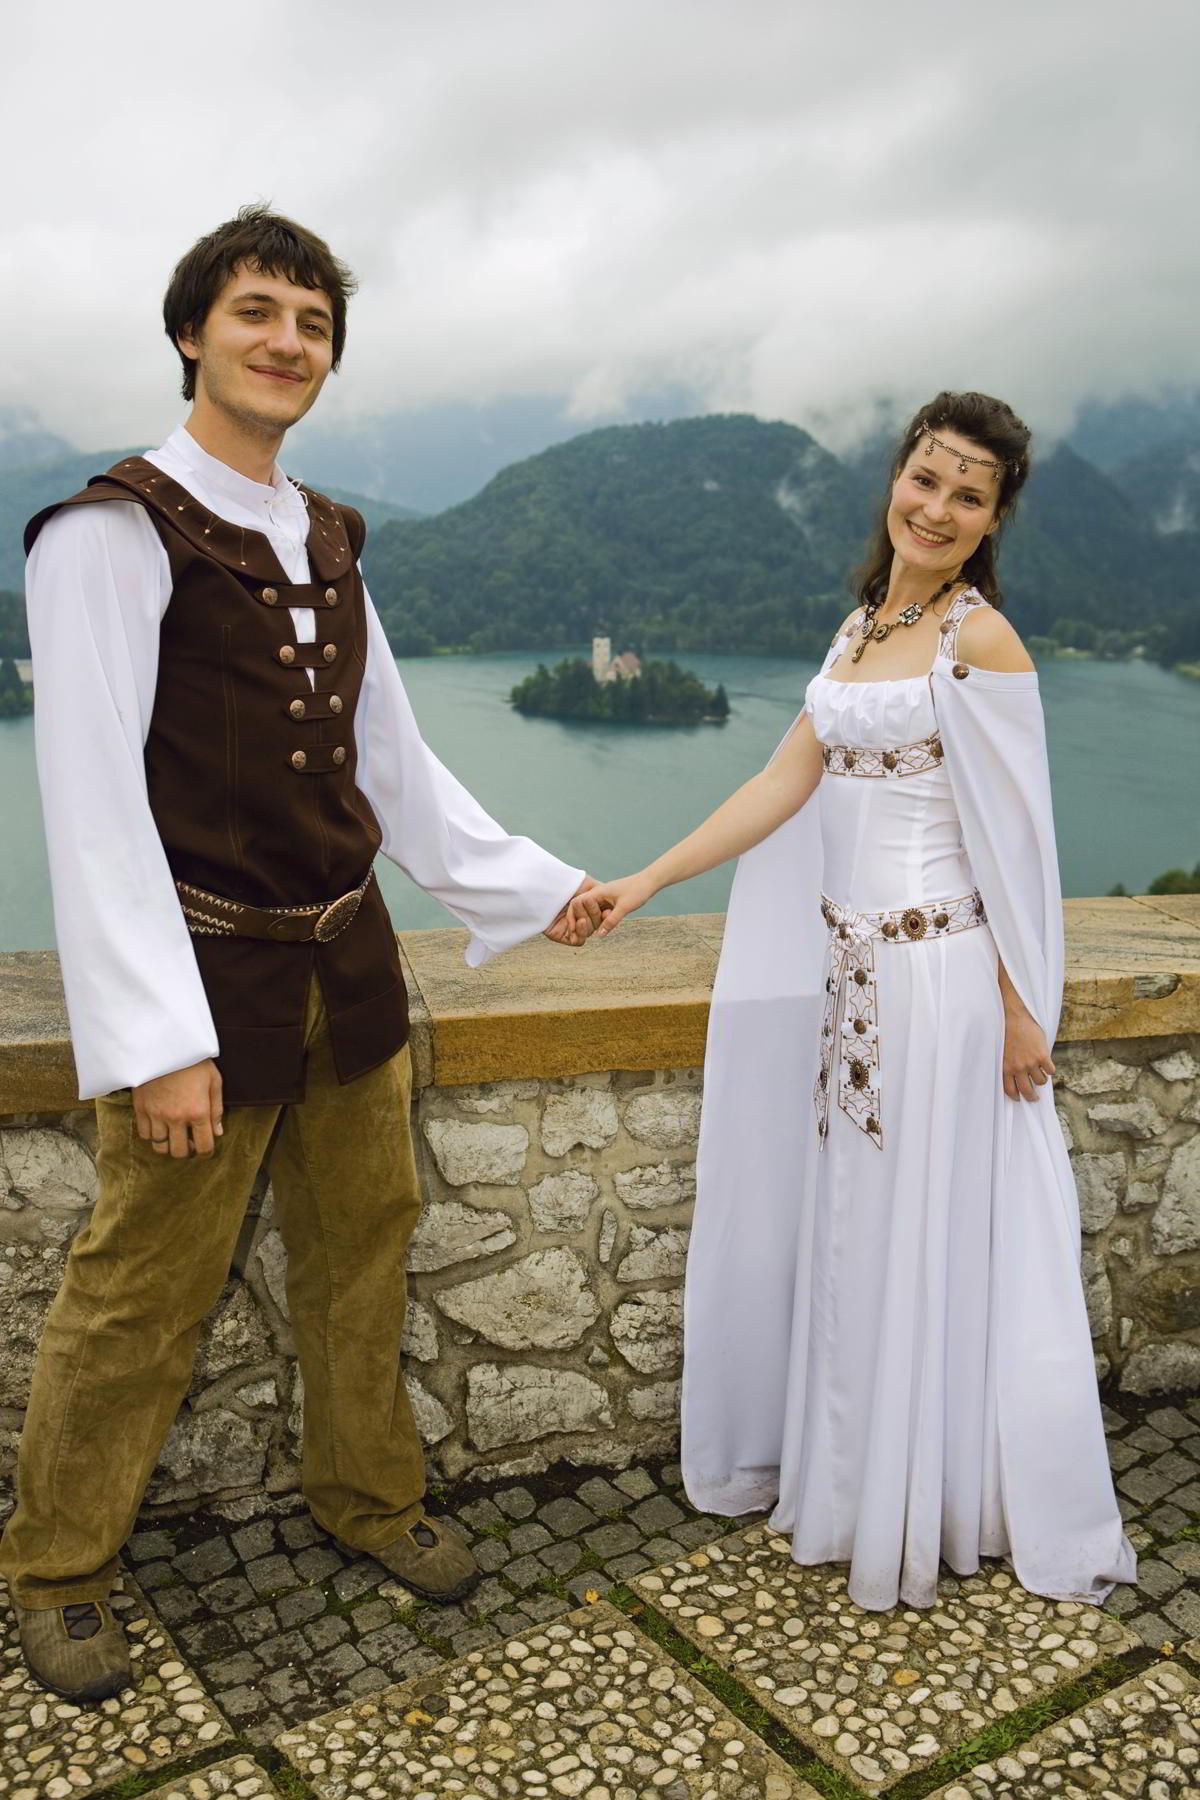 medieval wedding dresses patterns photo - 1